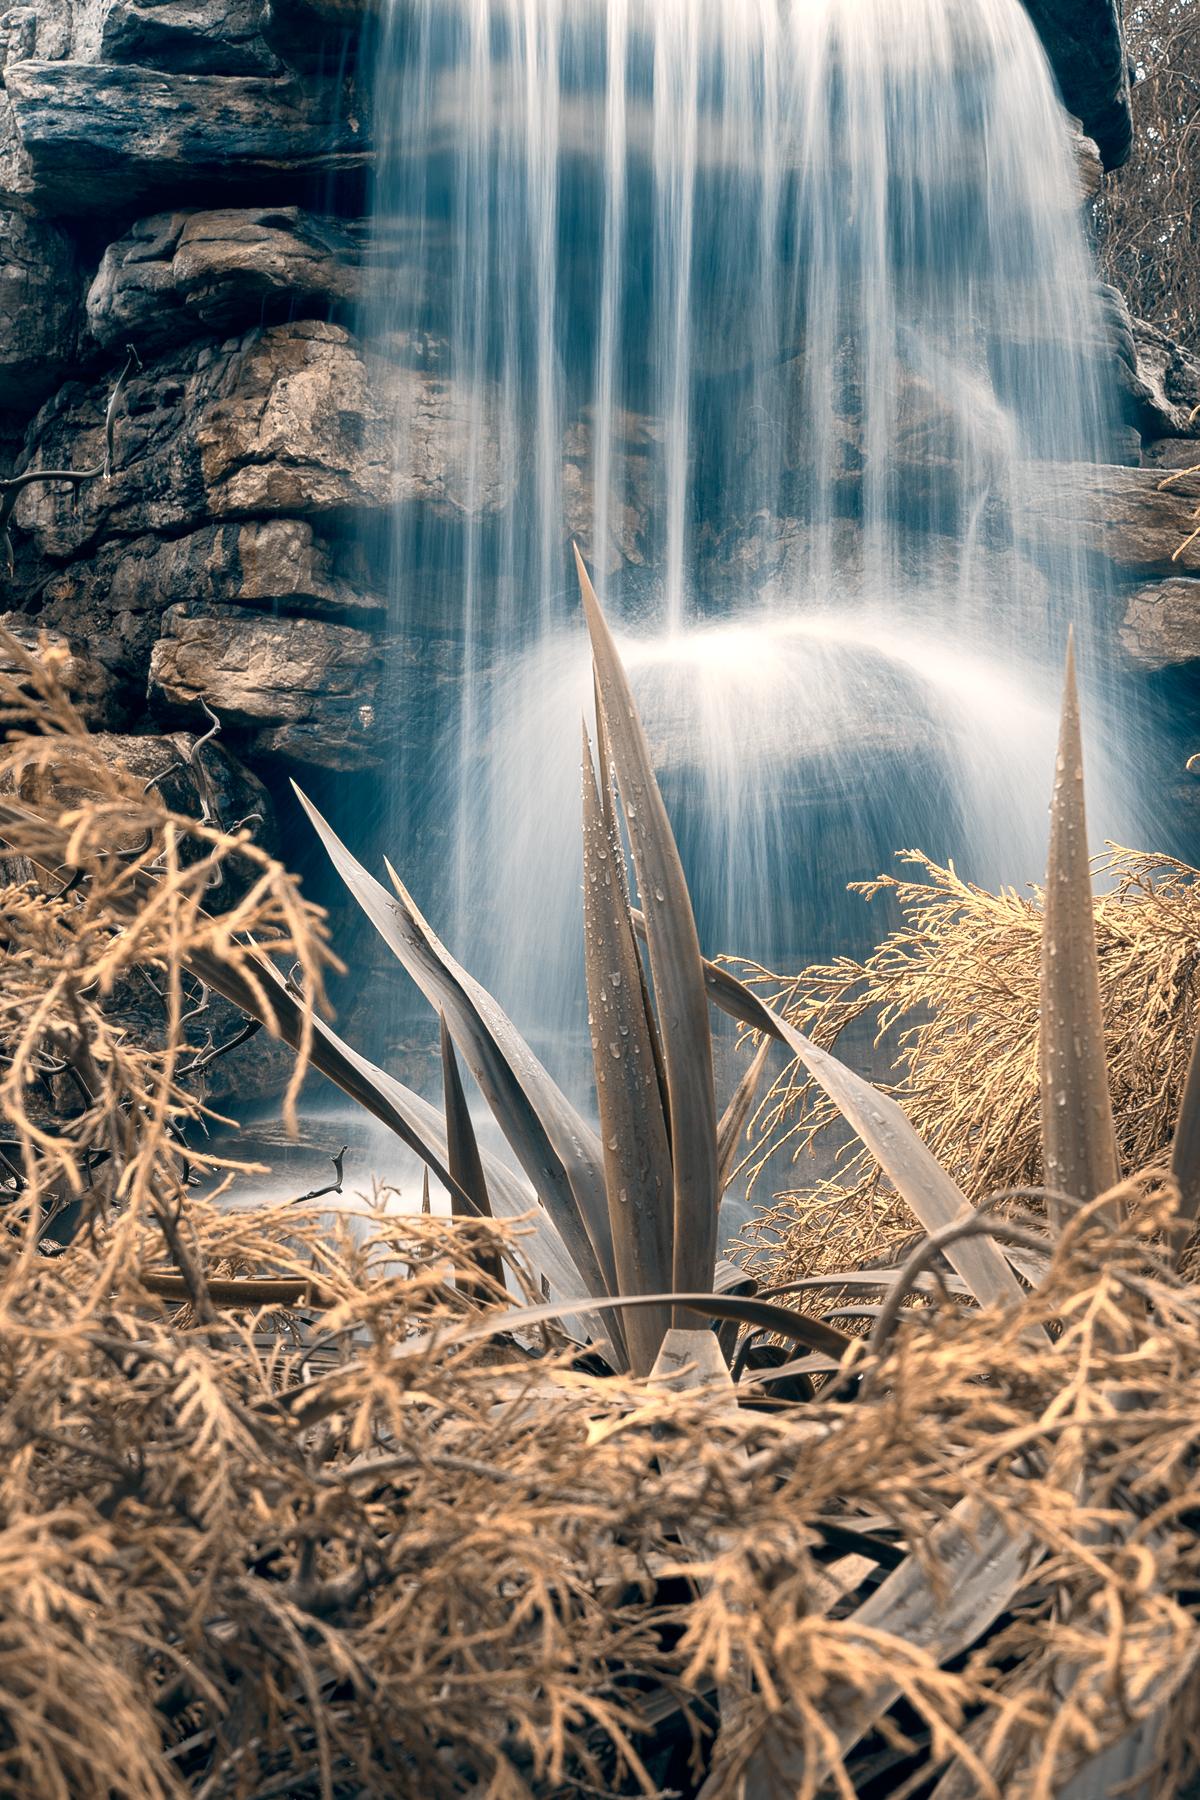 Cross-processed waterfall foliage - hdr photo